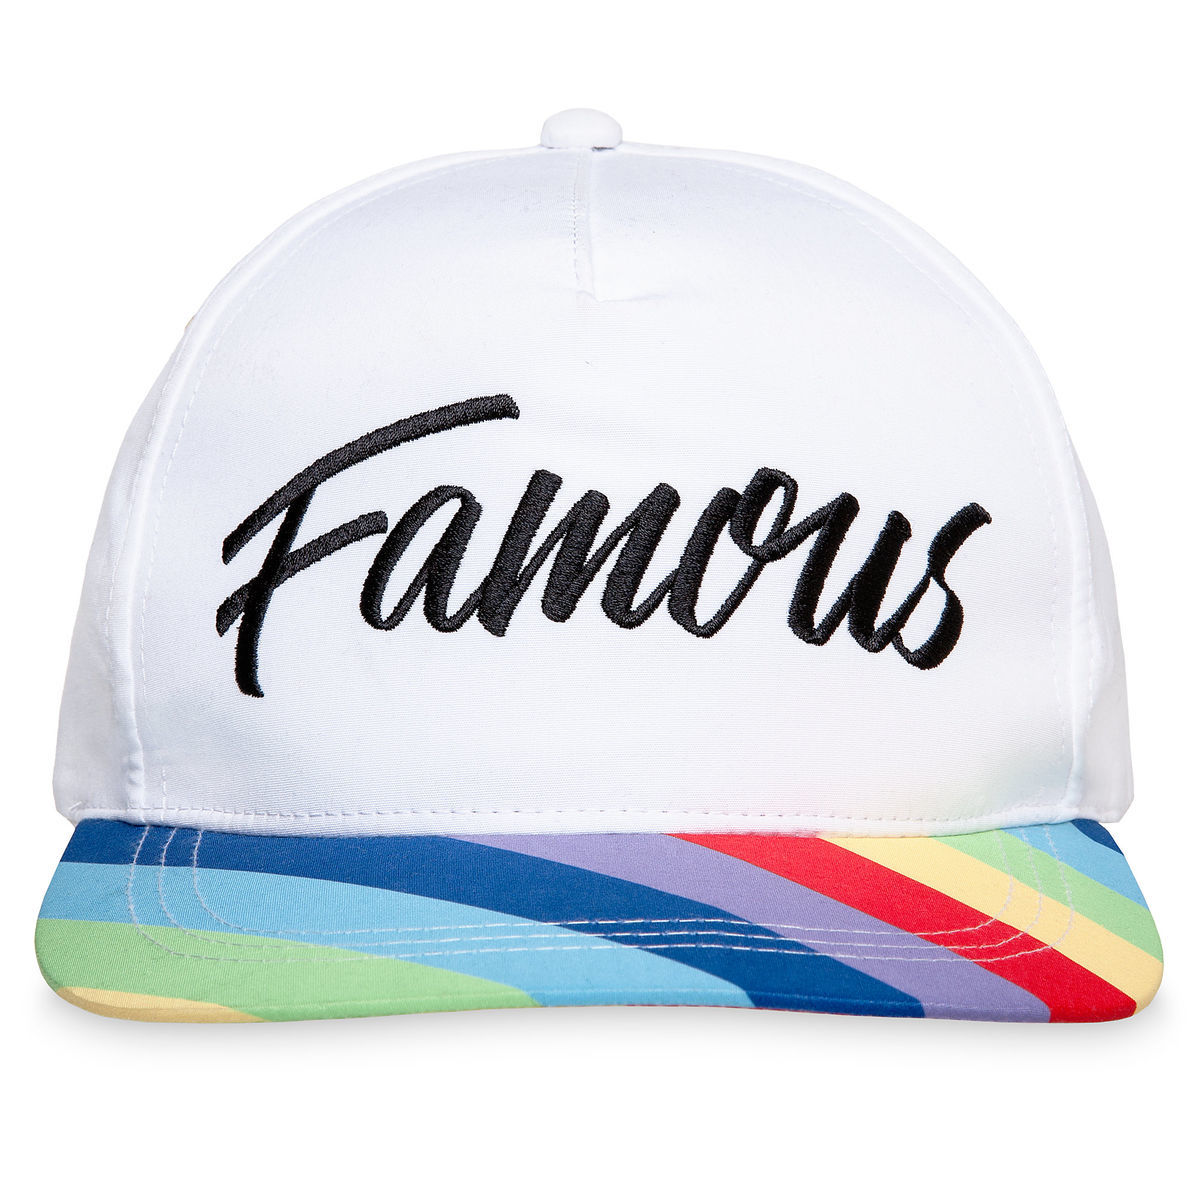 Product Image of Rainbow Unicorn   Famous   Baseball Cap for Adults - Inside eabf37513e5